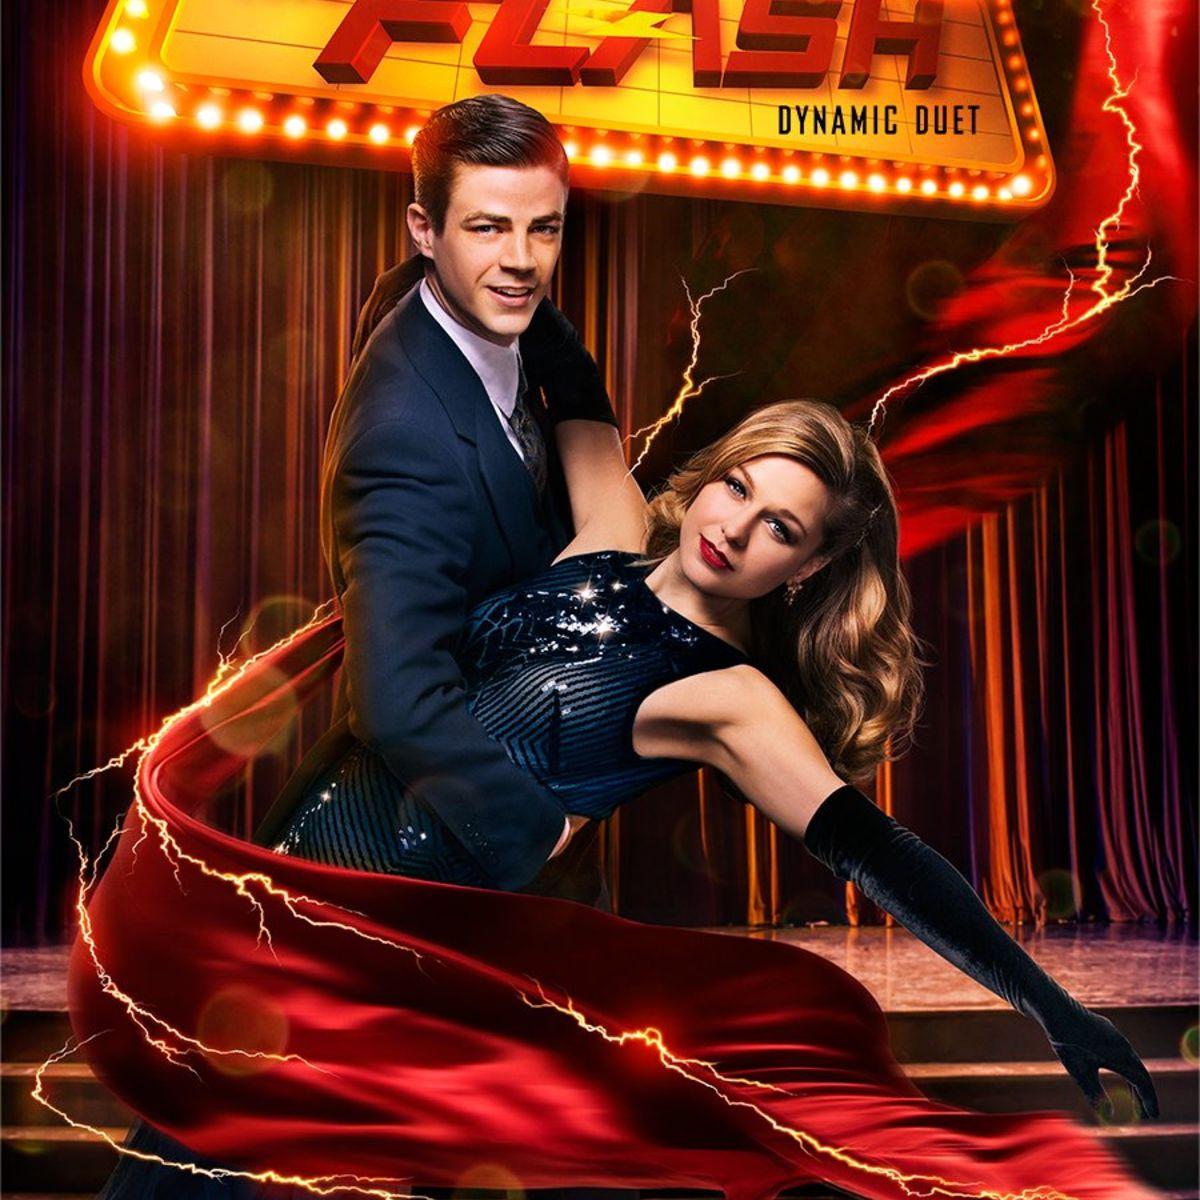 The-Flash-Duet-poster_0.jpg